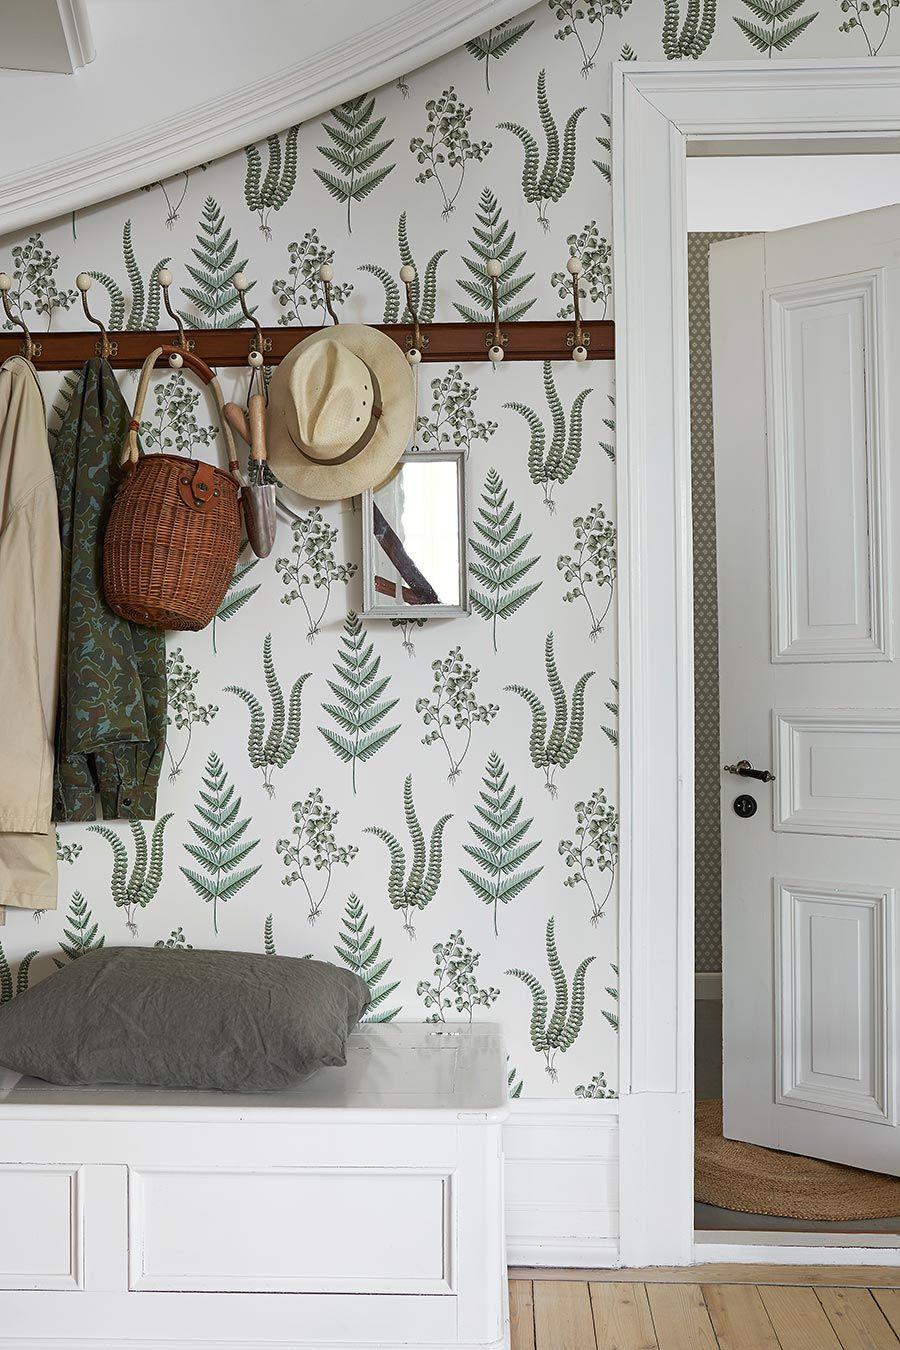 falsterbo tapeten von boras tapeter wirz tapeten we. Black Bedroom Furniture Sets. Home Design Ideas